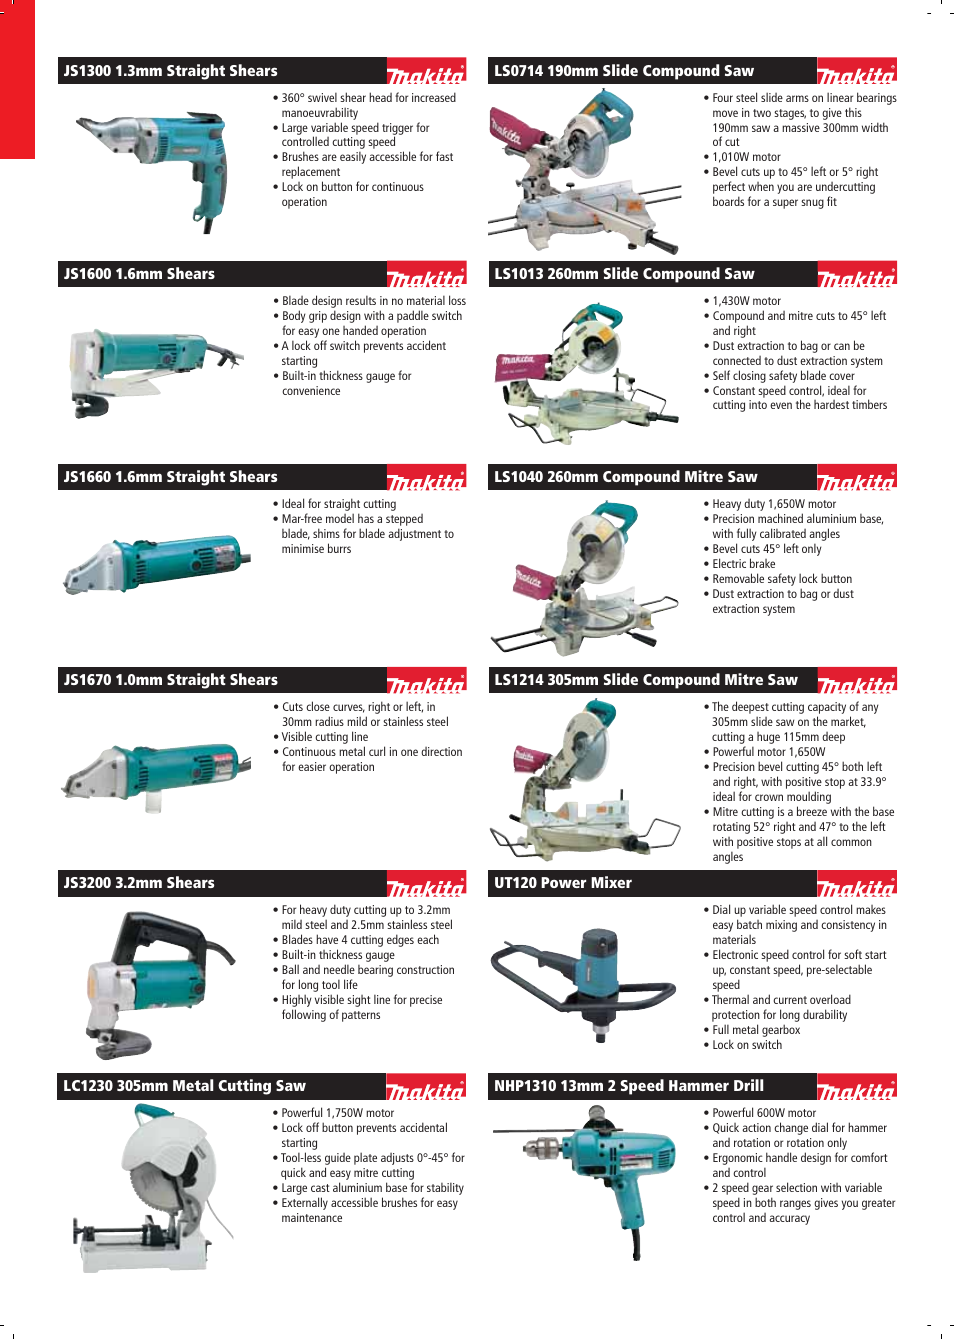 united tools national catalogue 2006 hitachi ds14dvf3 user manual rh manualsdir com Verizon LG User Manual Hitachi Repair Manual